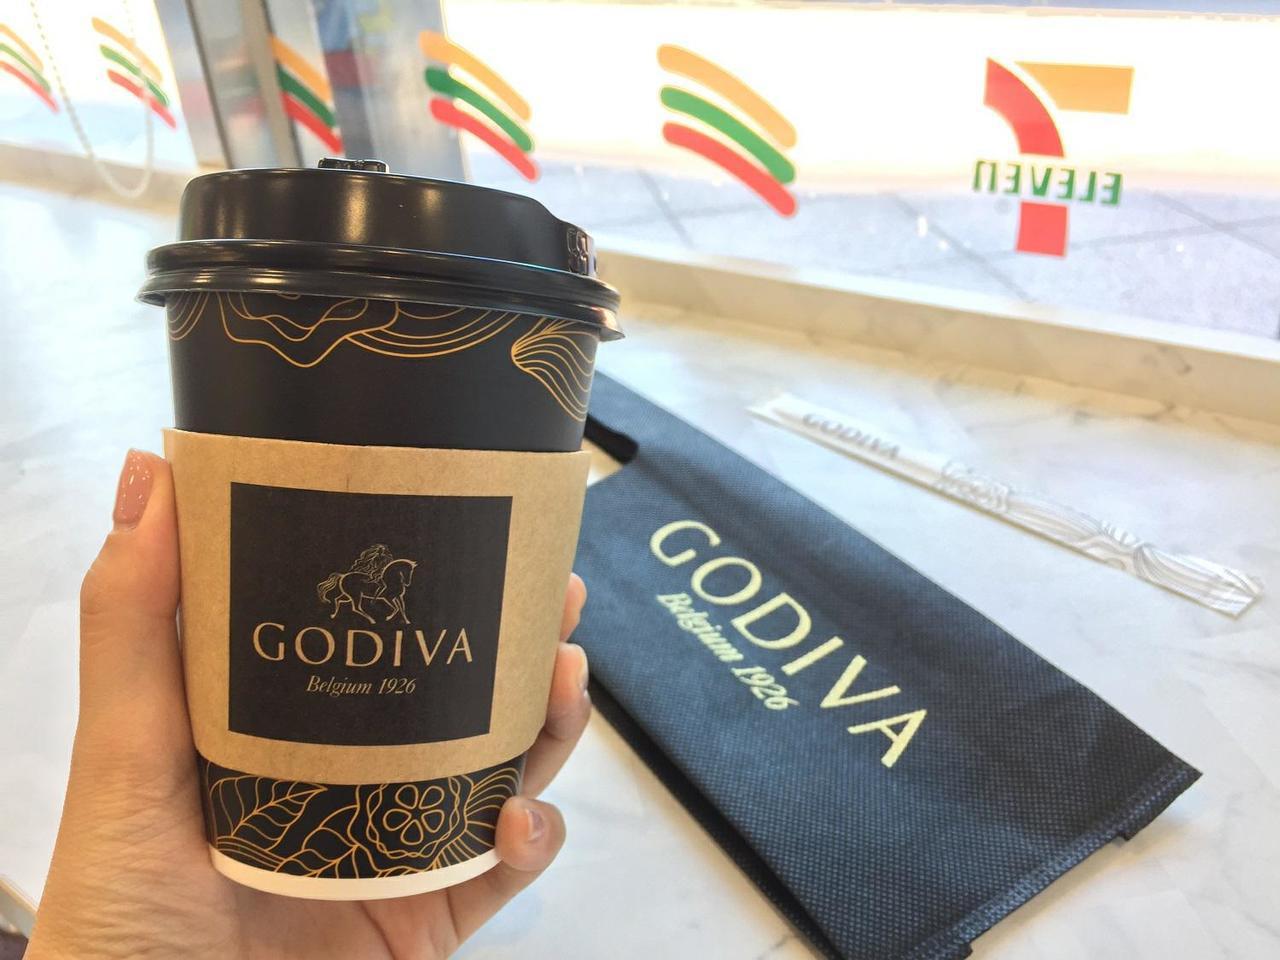 GODIVA醇黑熱巧克力全台限量65萬杯。(照片提供:7-ELEVEN)